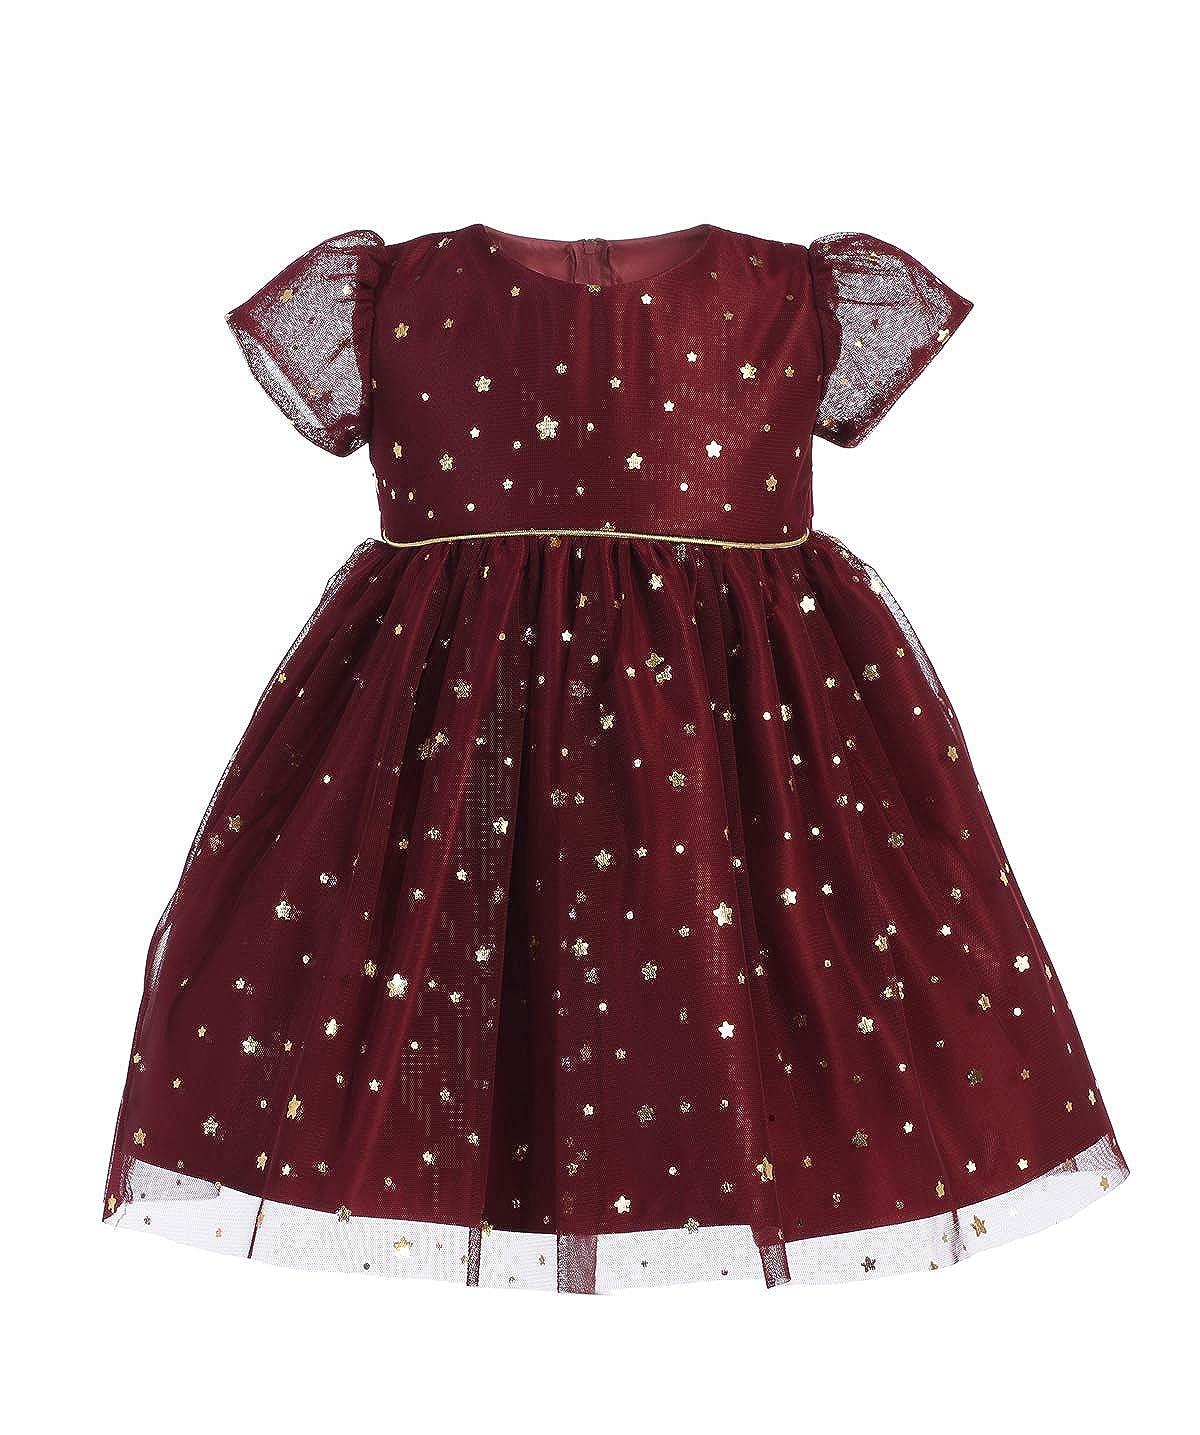 4d094304a Amazon.com: Burgundy Navy Blue Baby Girls Dress Star Gold Flower Christmas  Holiday Wedding Party Birthday: Clothing